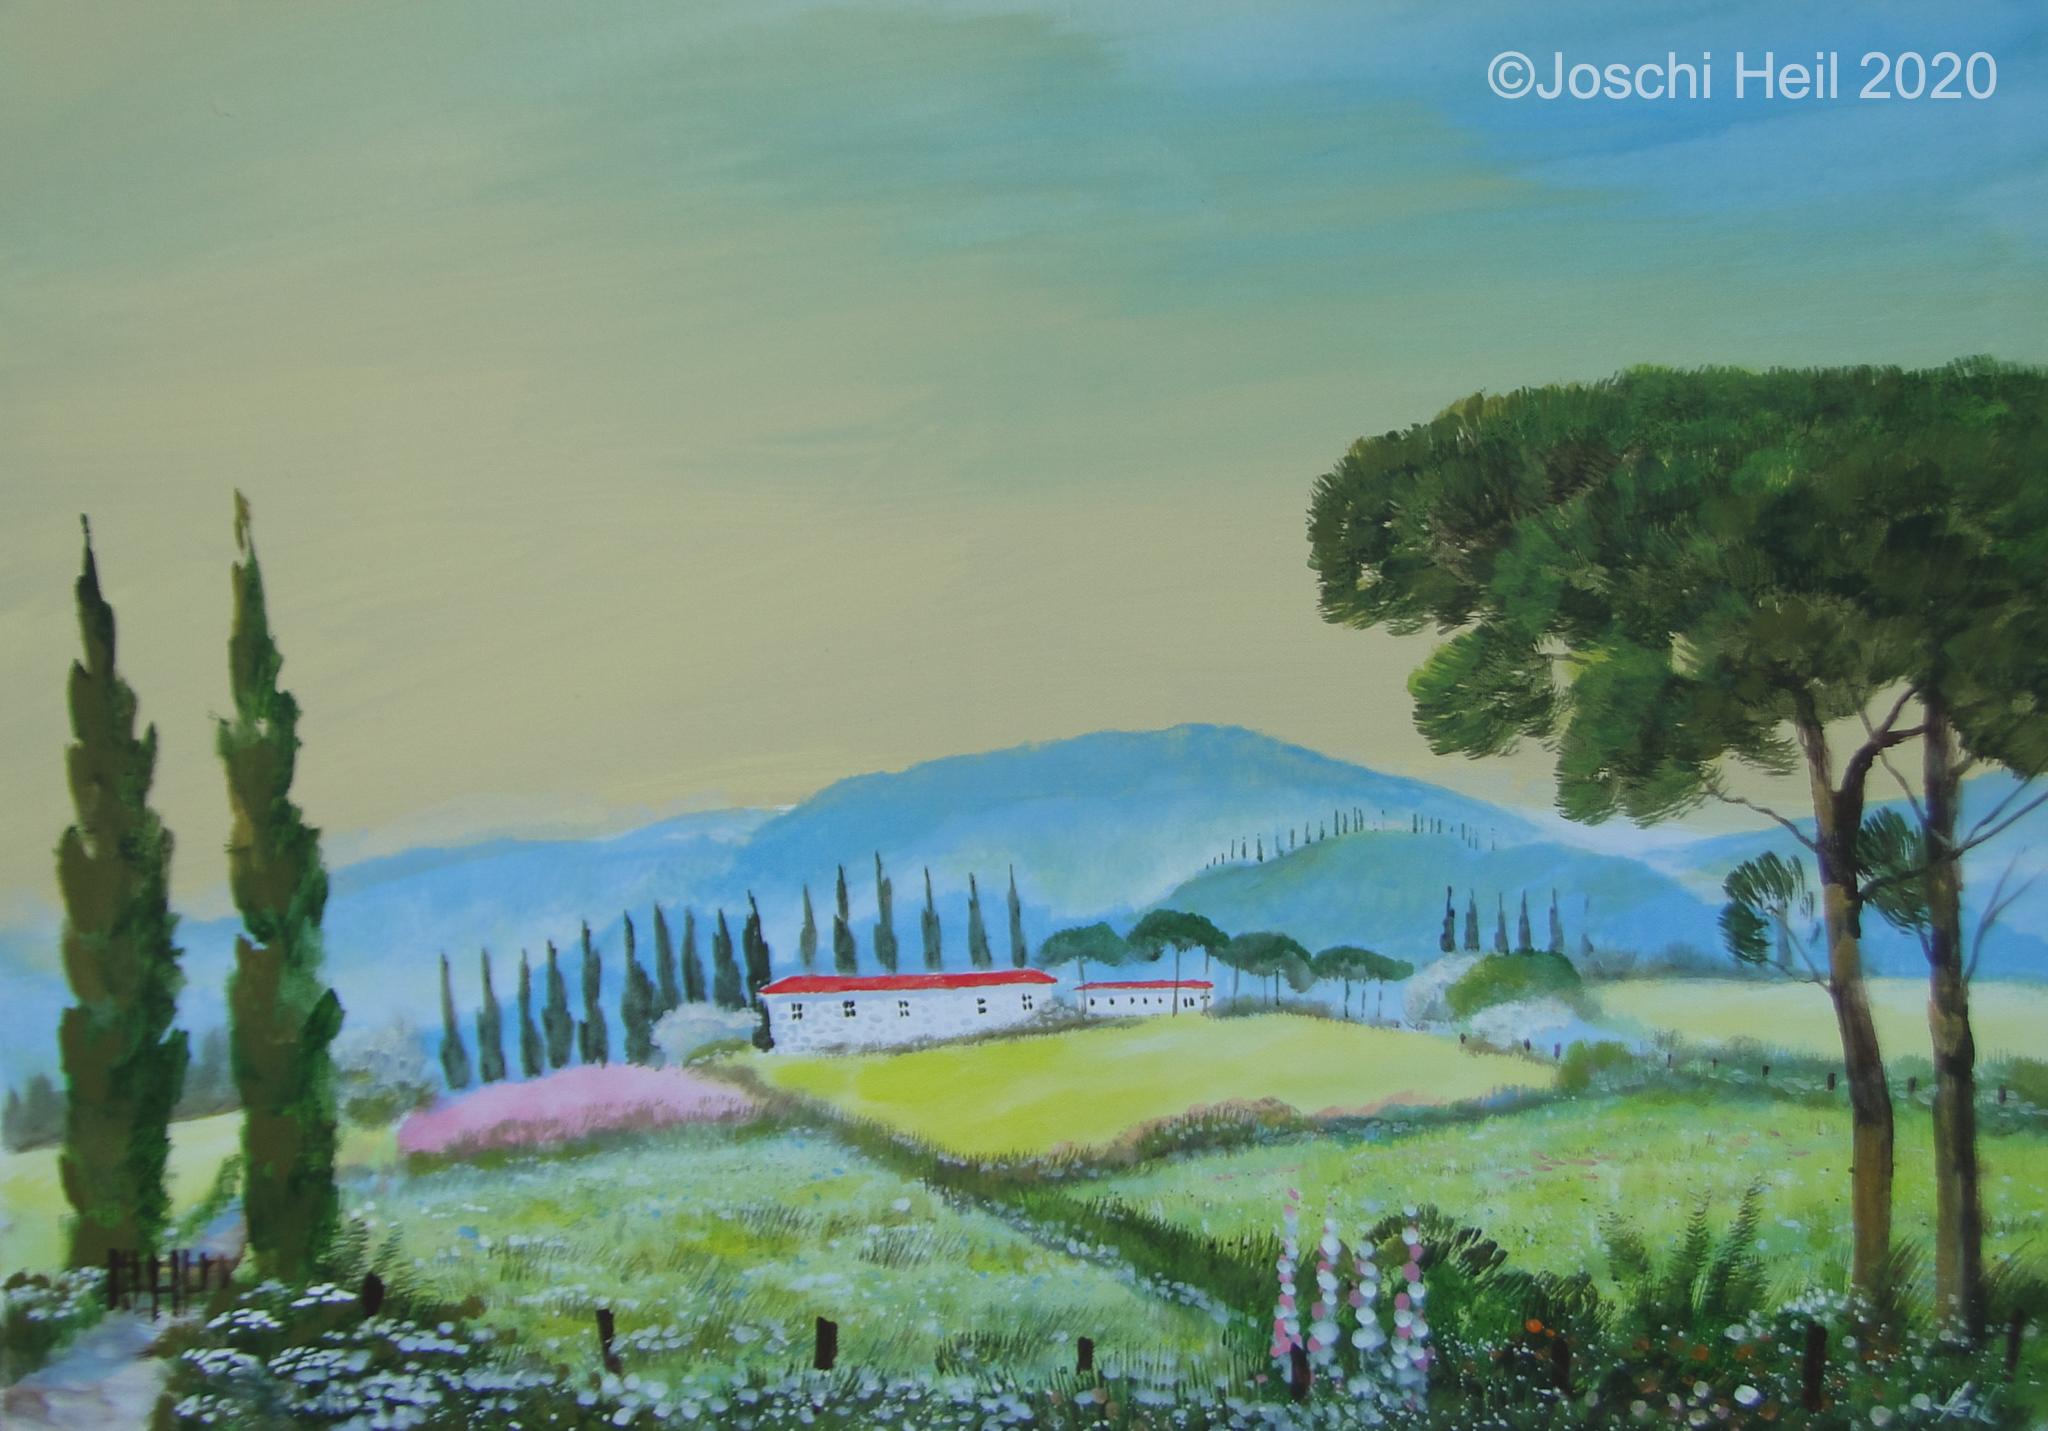 Joschi Heil